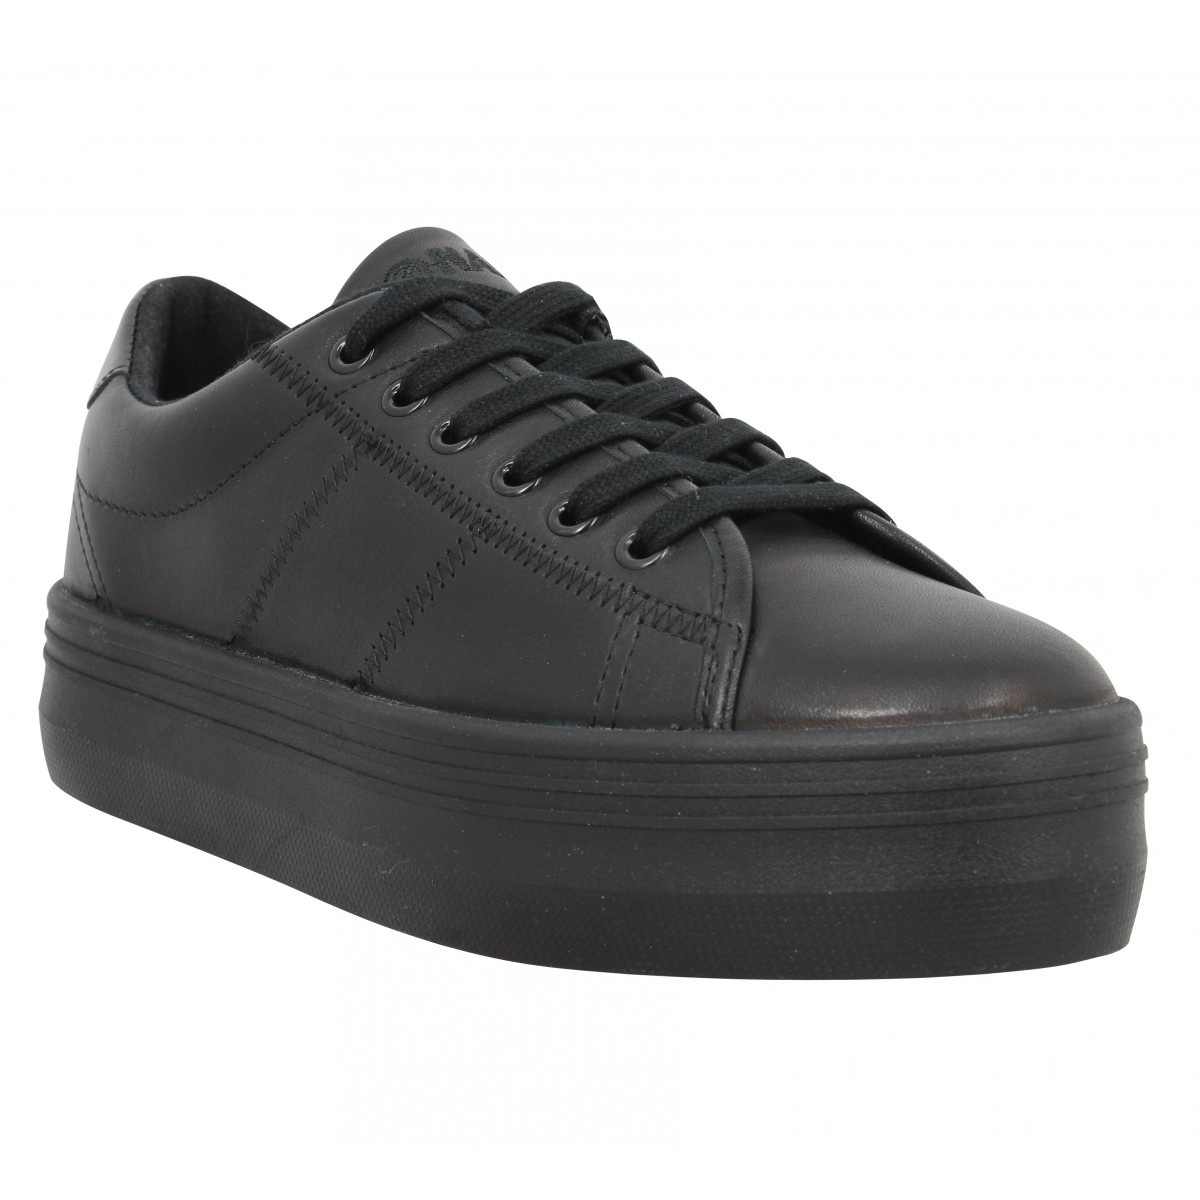 Baskets NO NAME Plato Sneaker nappa Femme Black